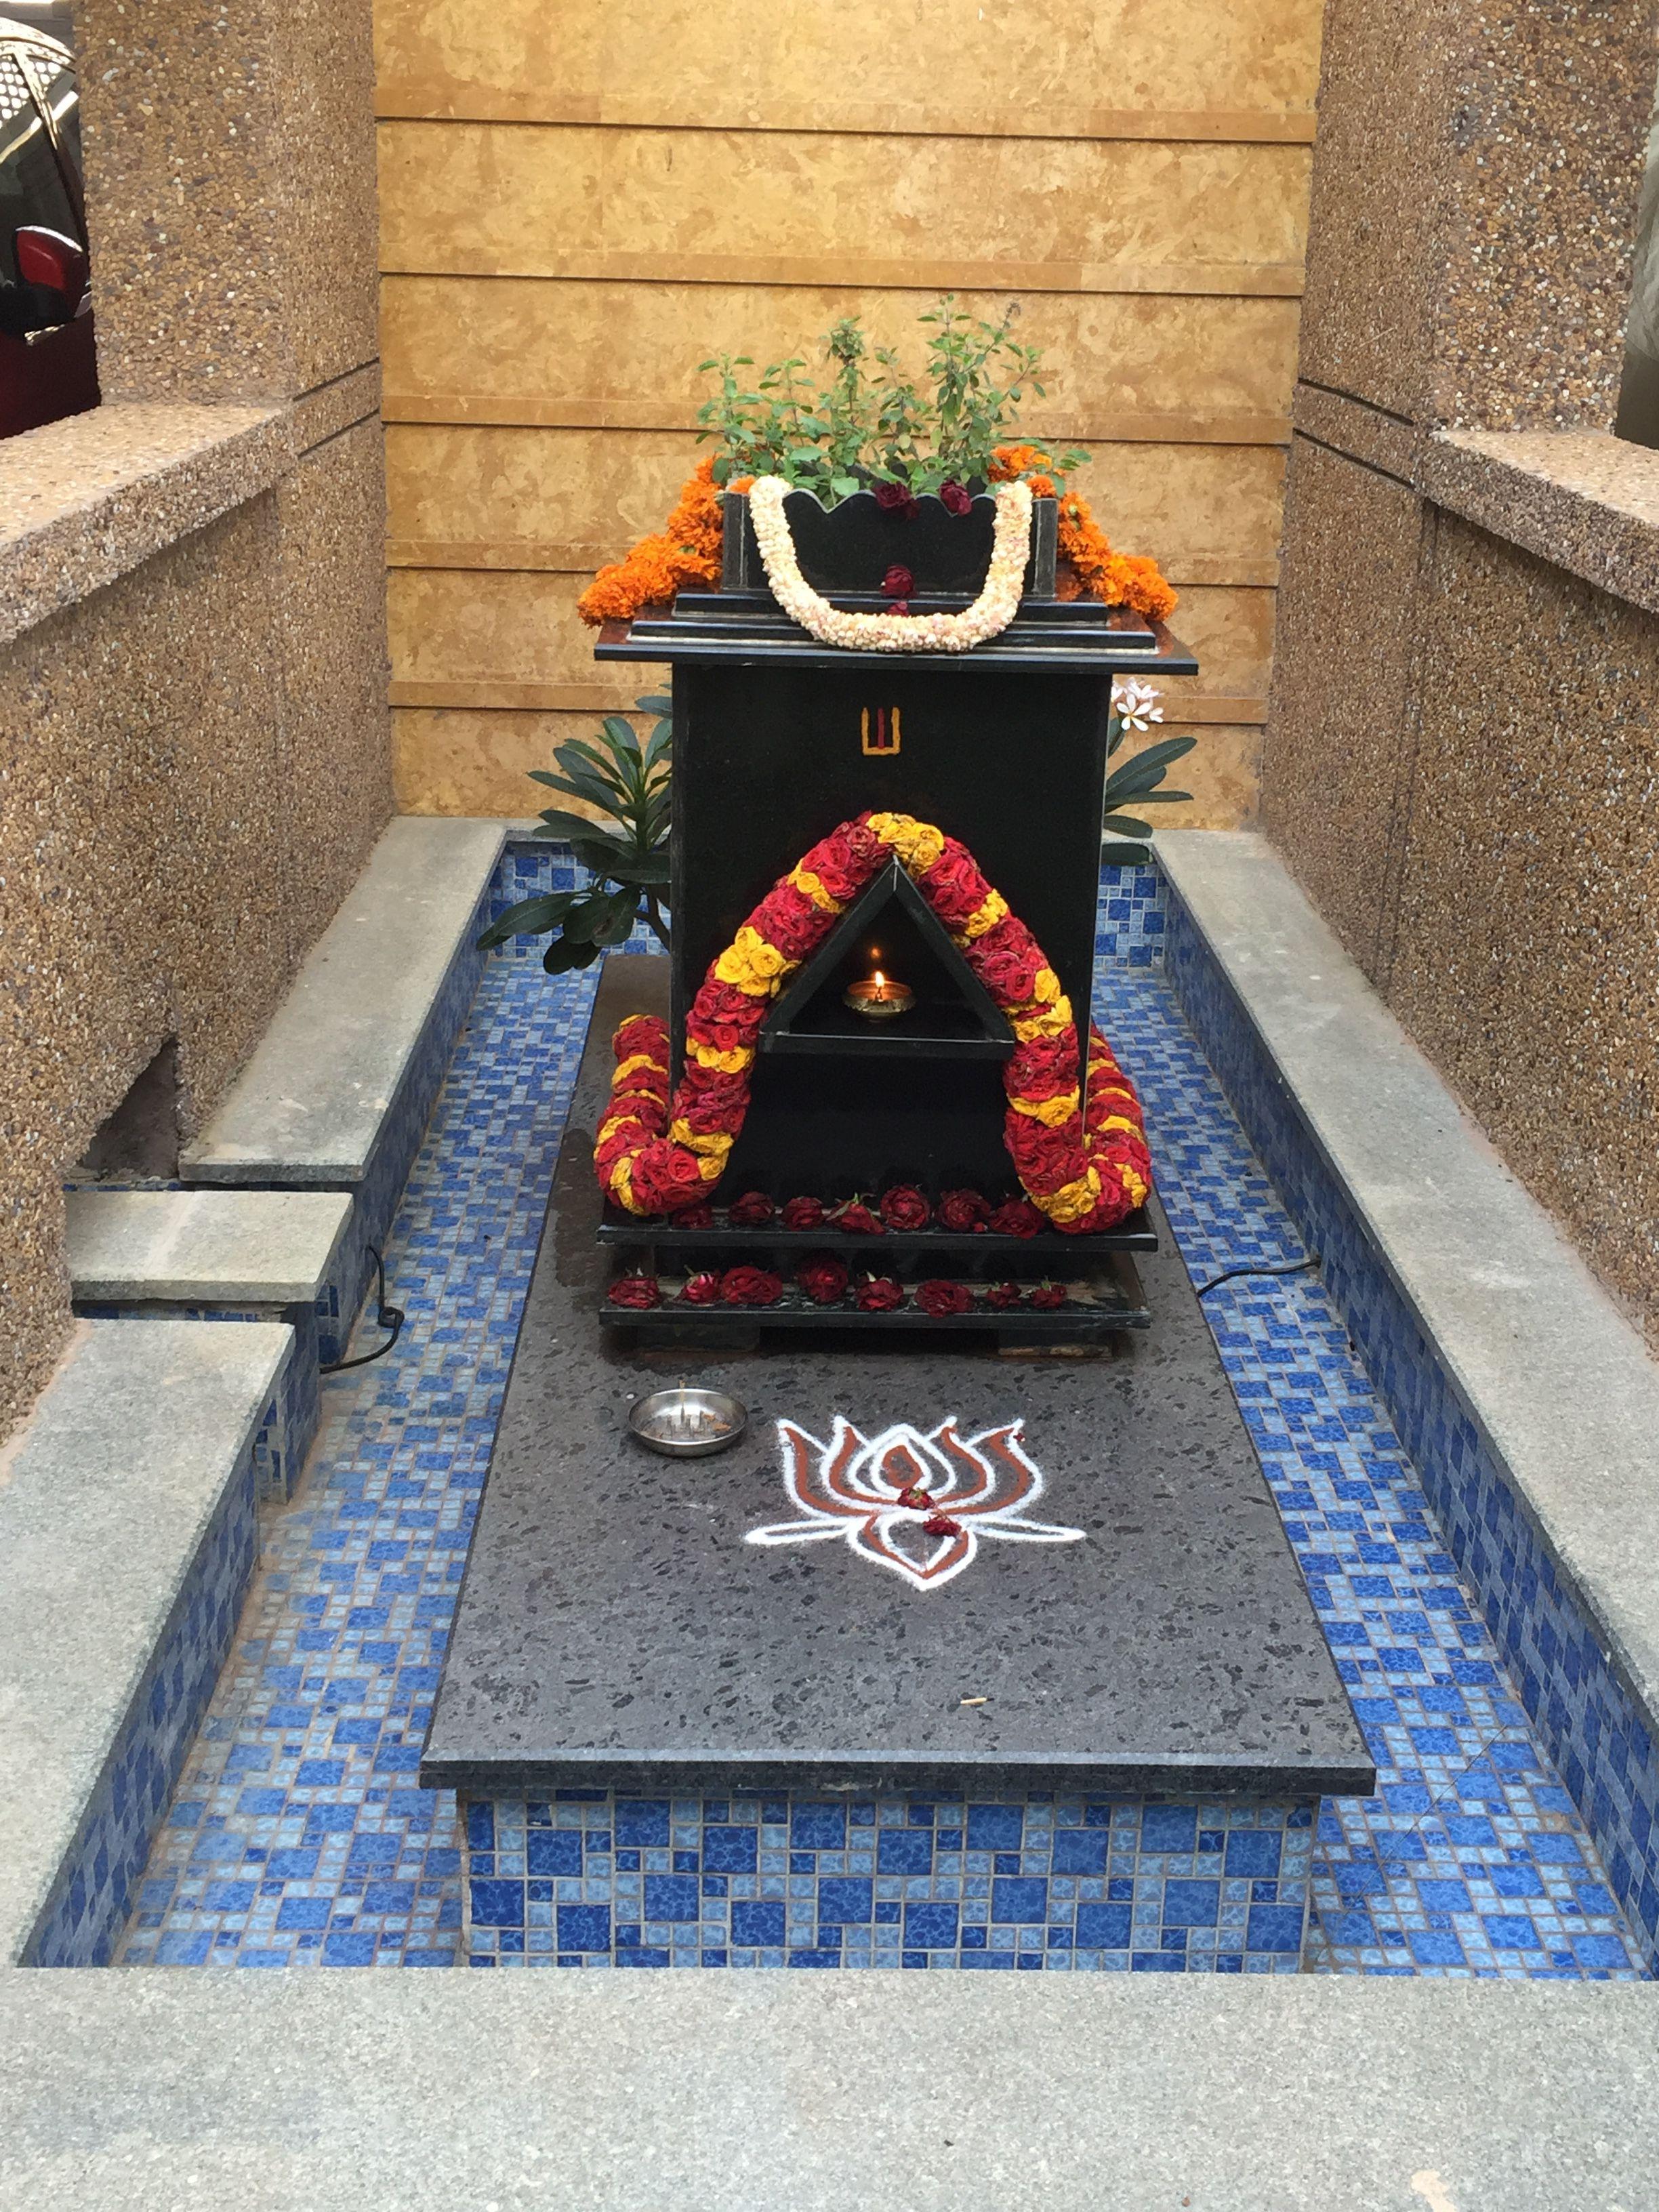 Bharathidasan k bharathidasan1 on pinterest